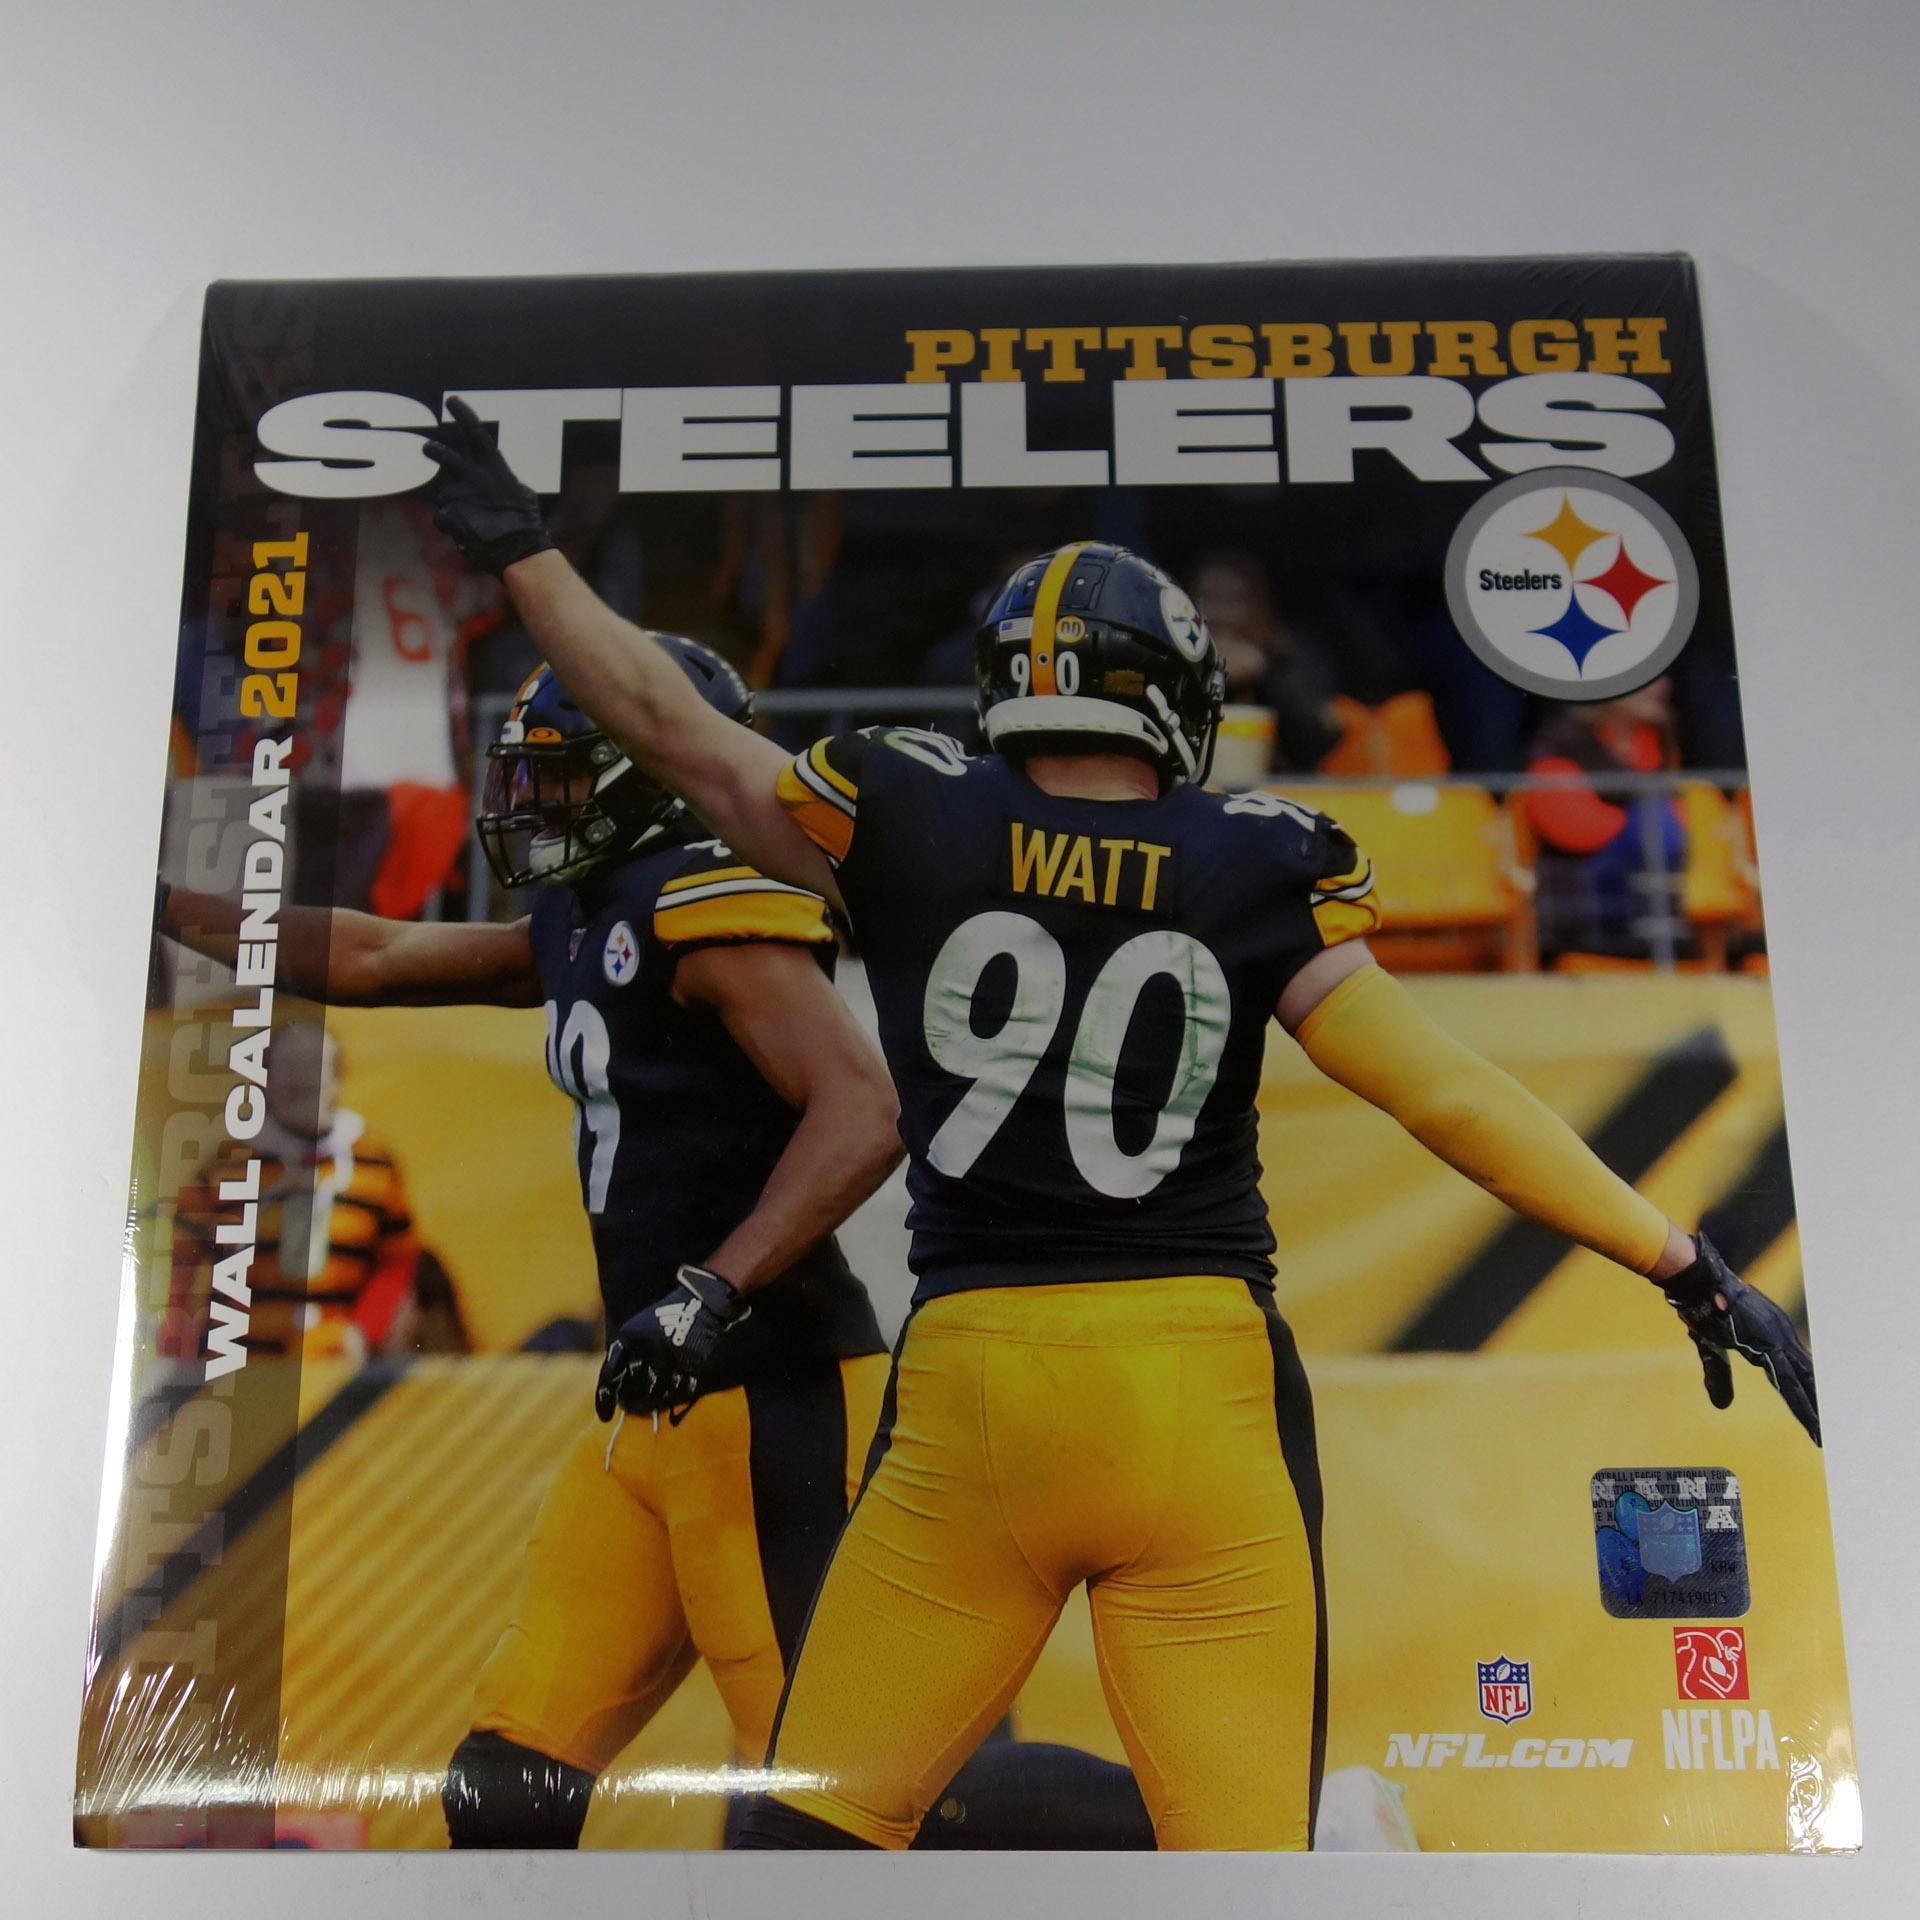 NFL Wandkalender Pittsburgh Steelers 2021